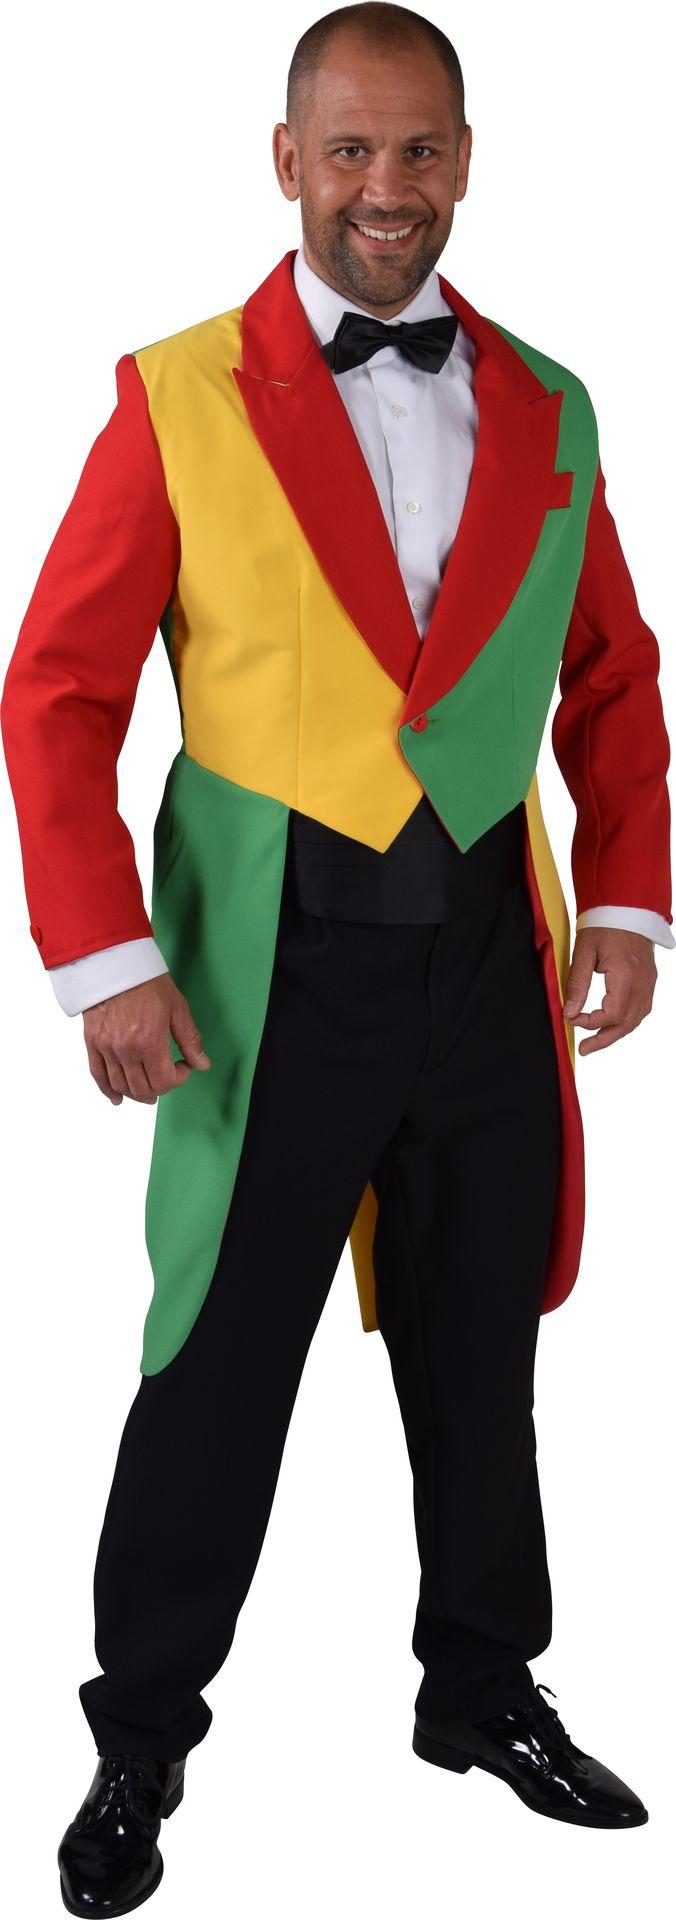 Spreekstalmeester mannen pak